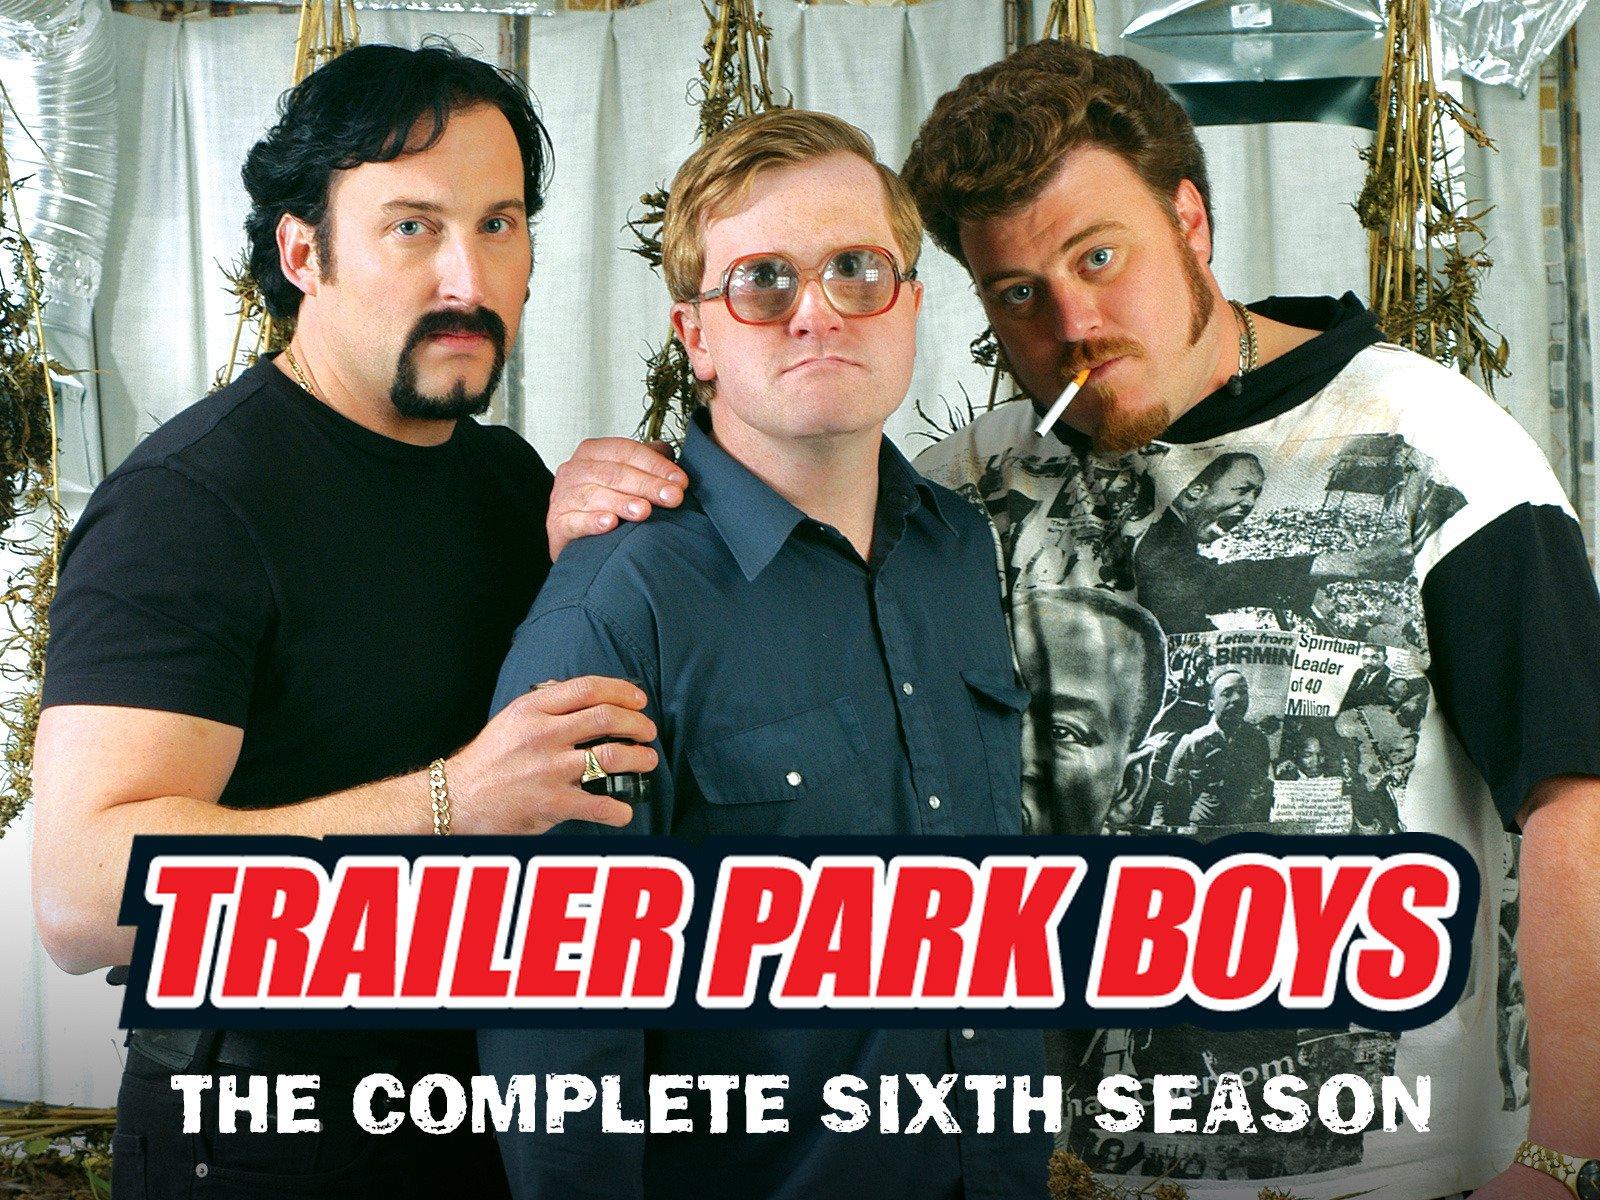 Watch Trailer Park Boys Season 6 Prime Video